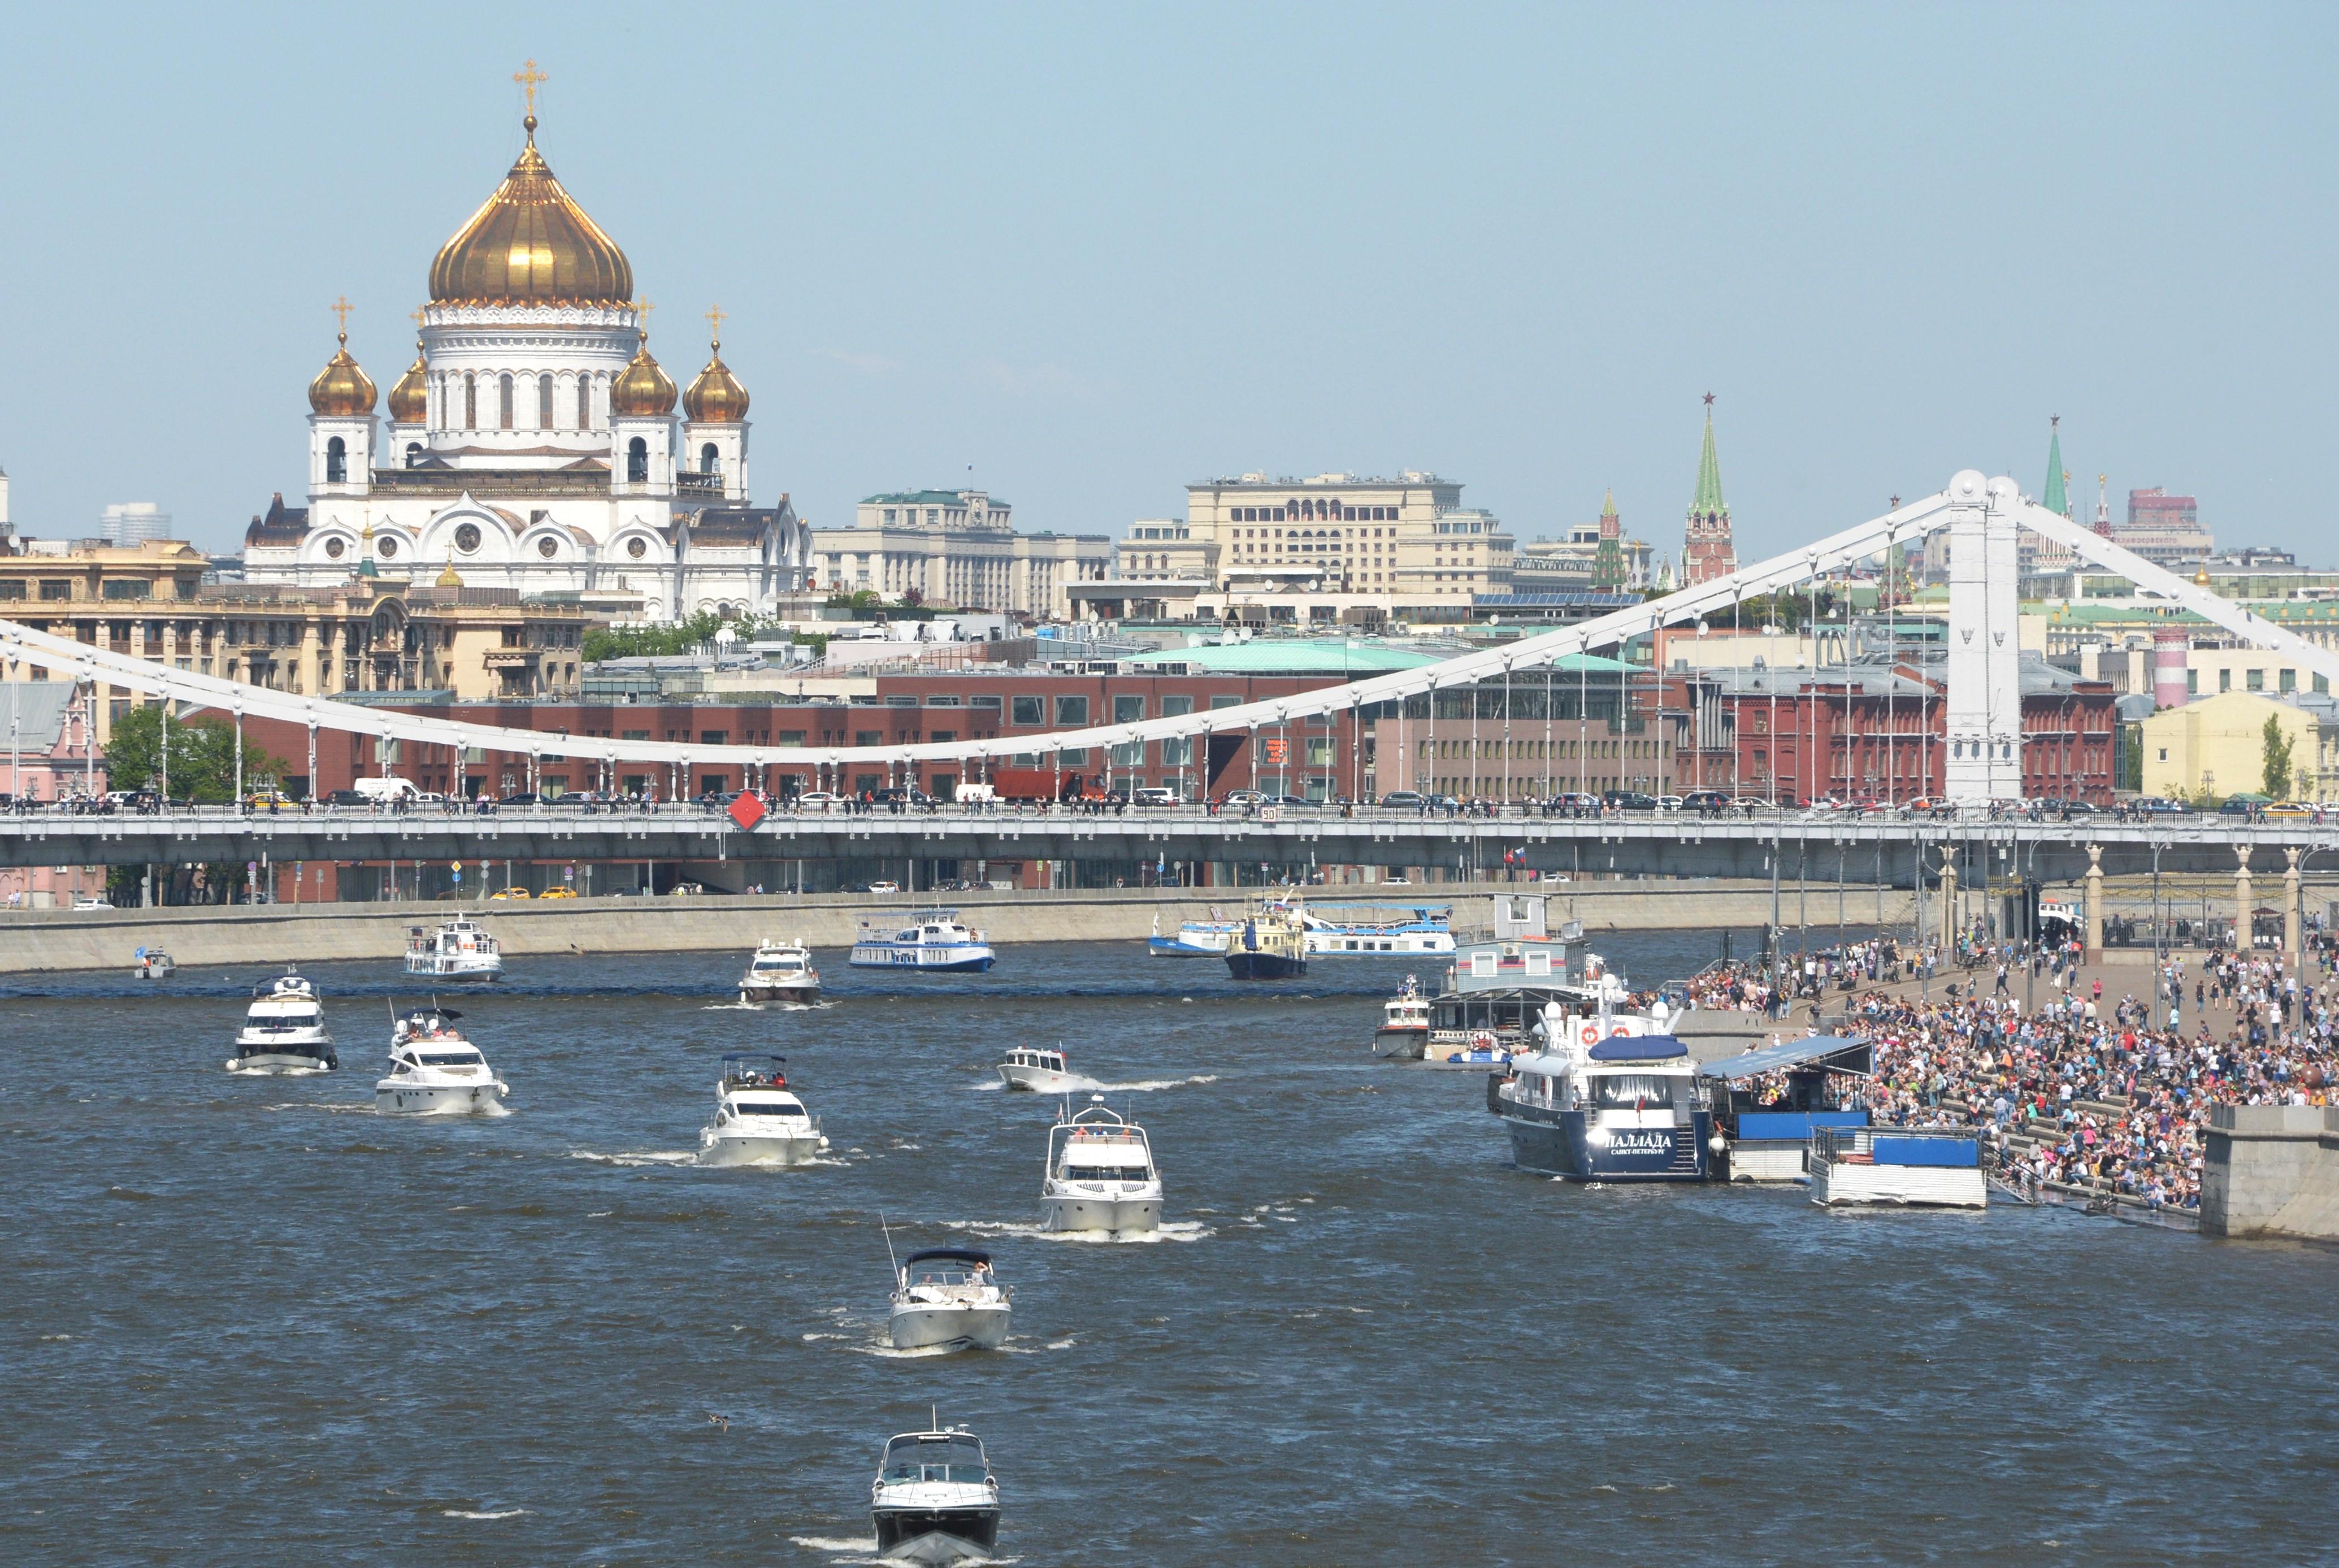 <p>Фото: &copy; РИА Новости / Илья Питалев</p>